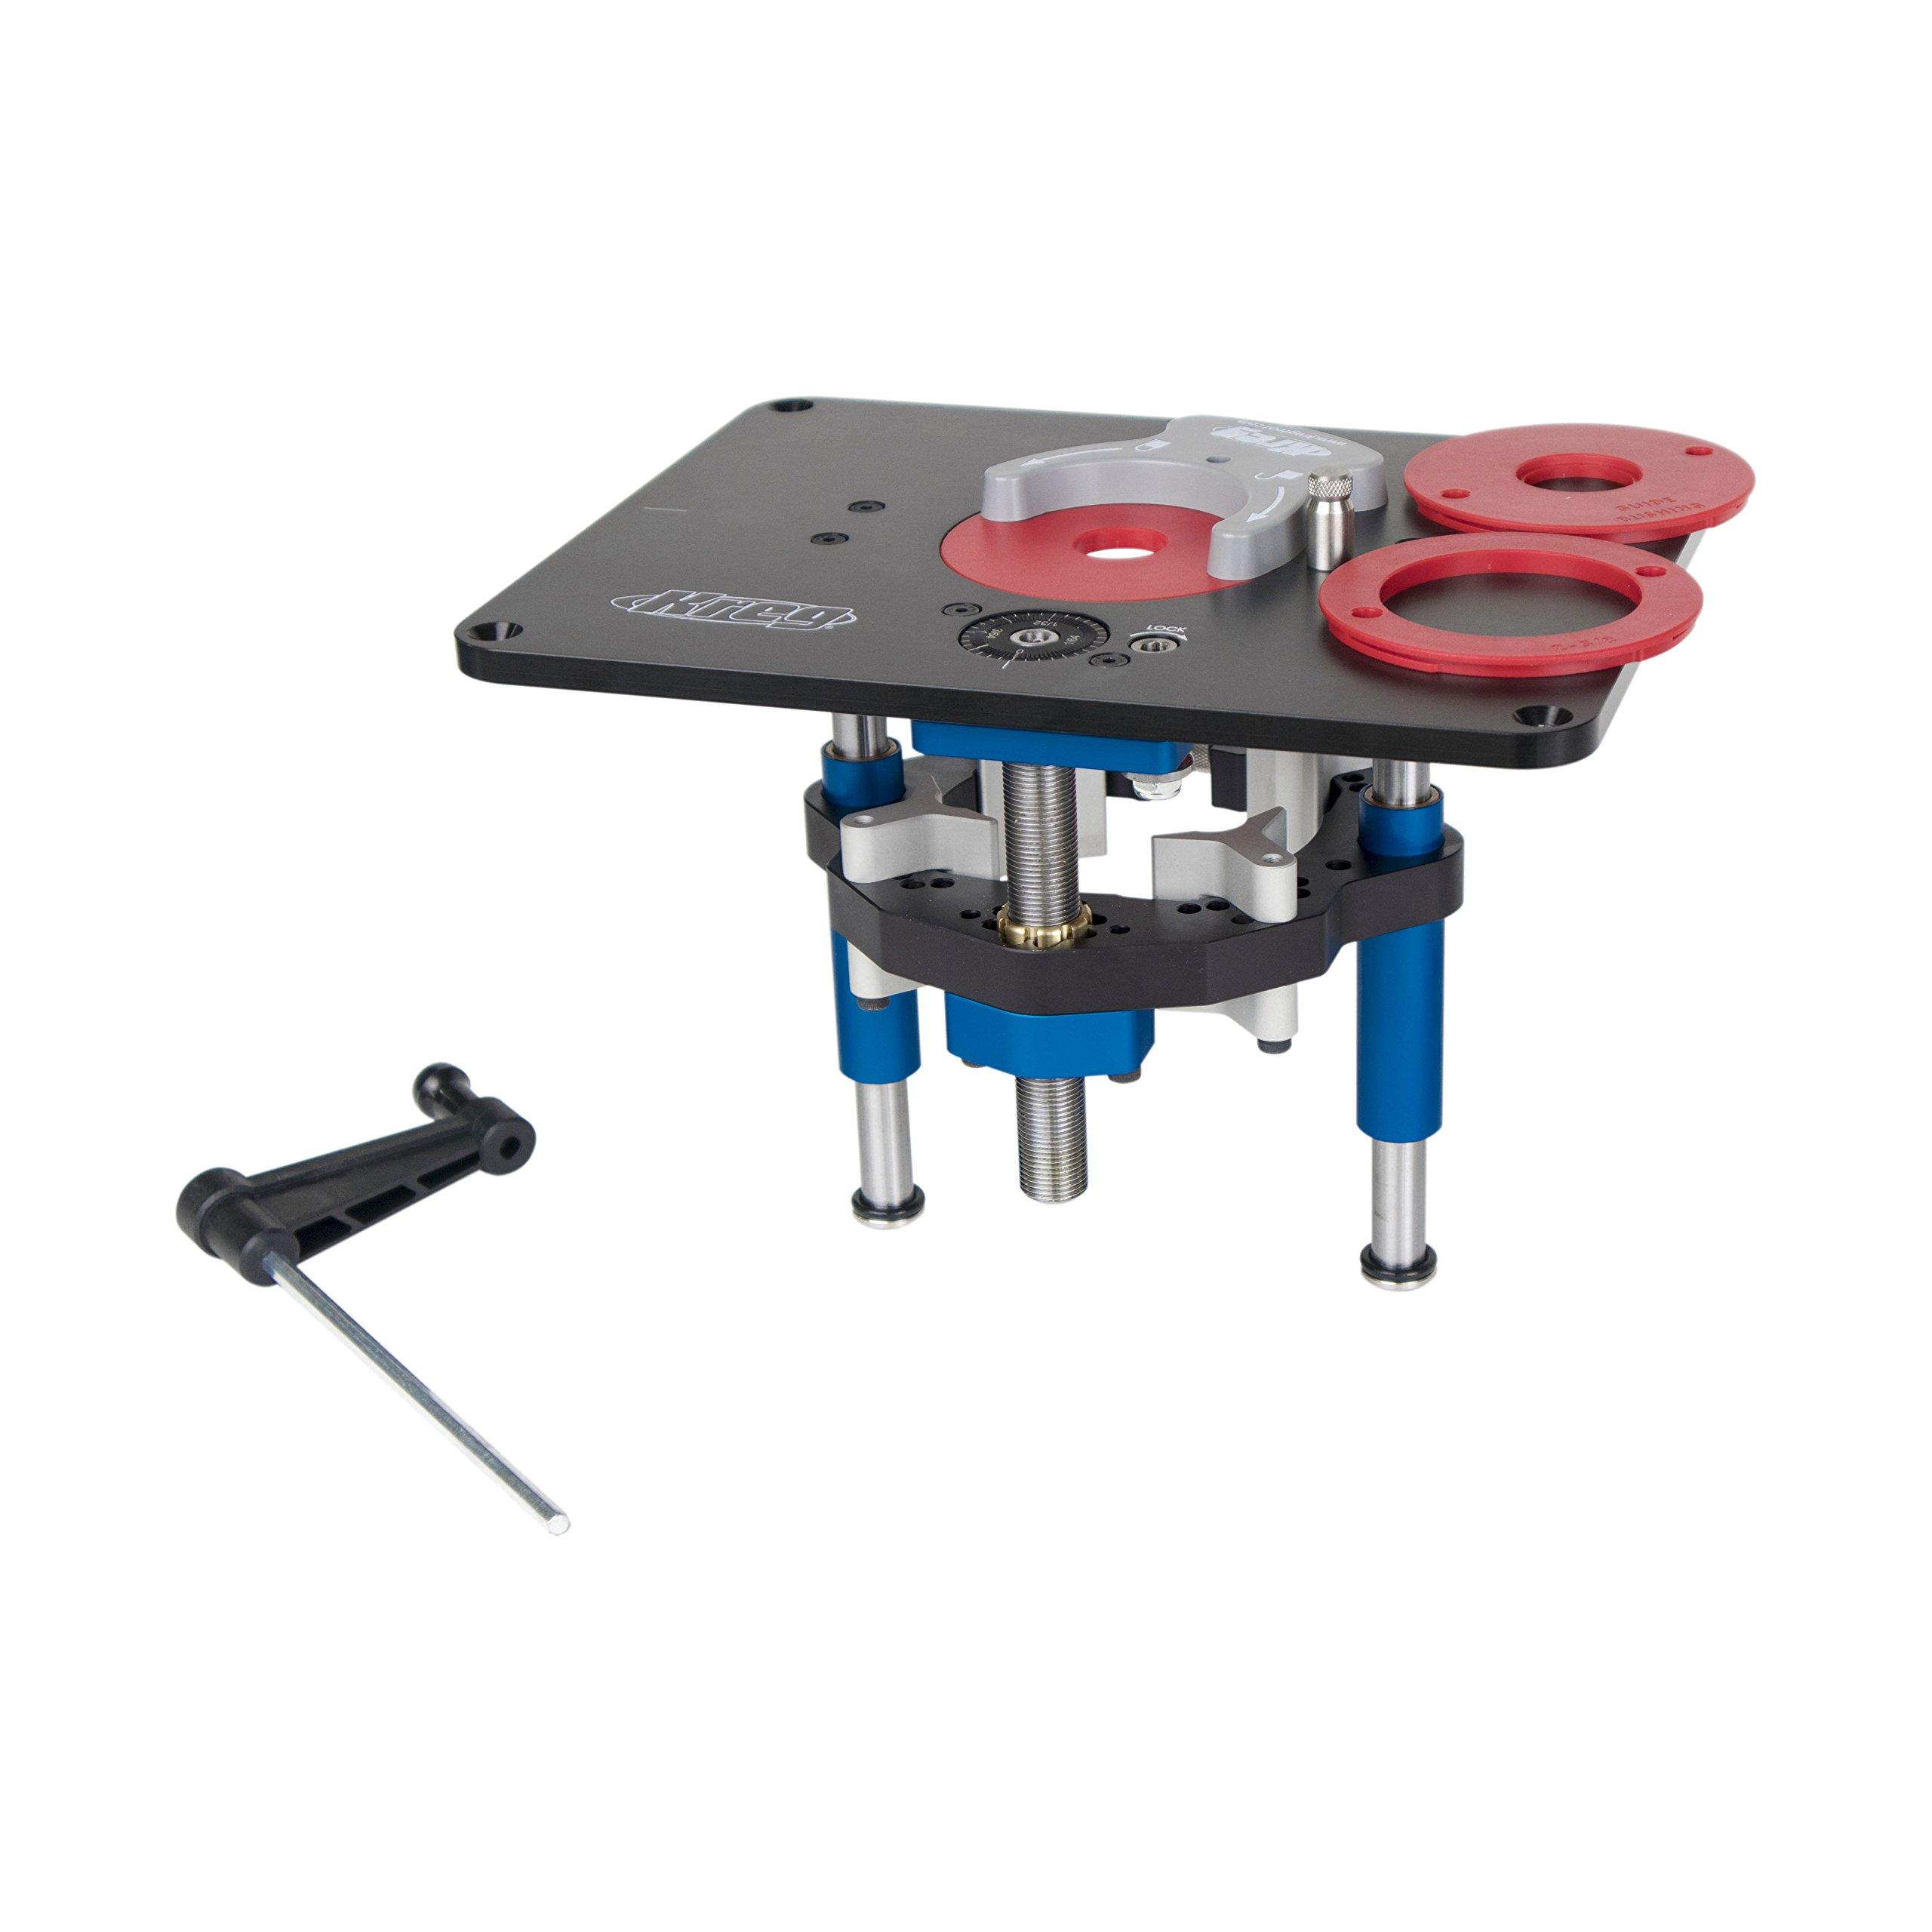 Kreg Prs3400 Precision Router Table Setup Bars Set Of 7 - The Best ...